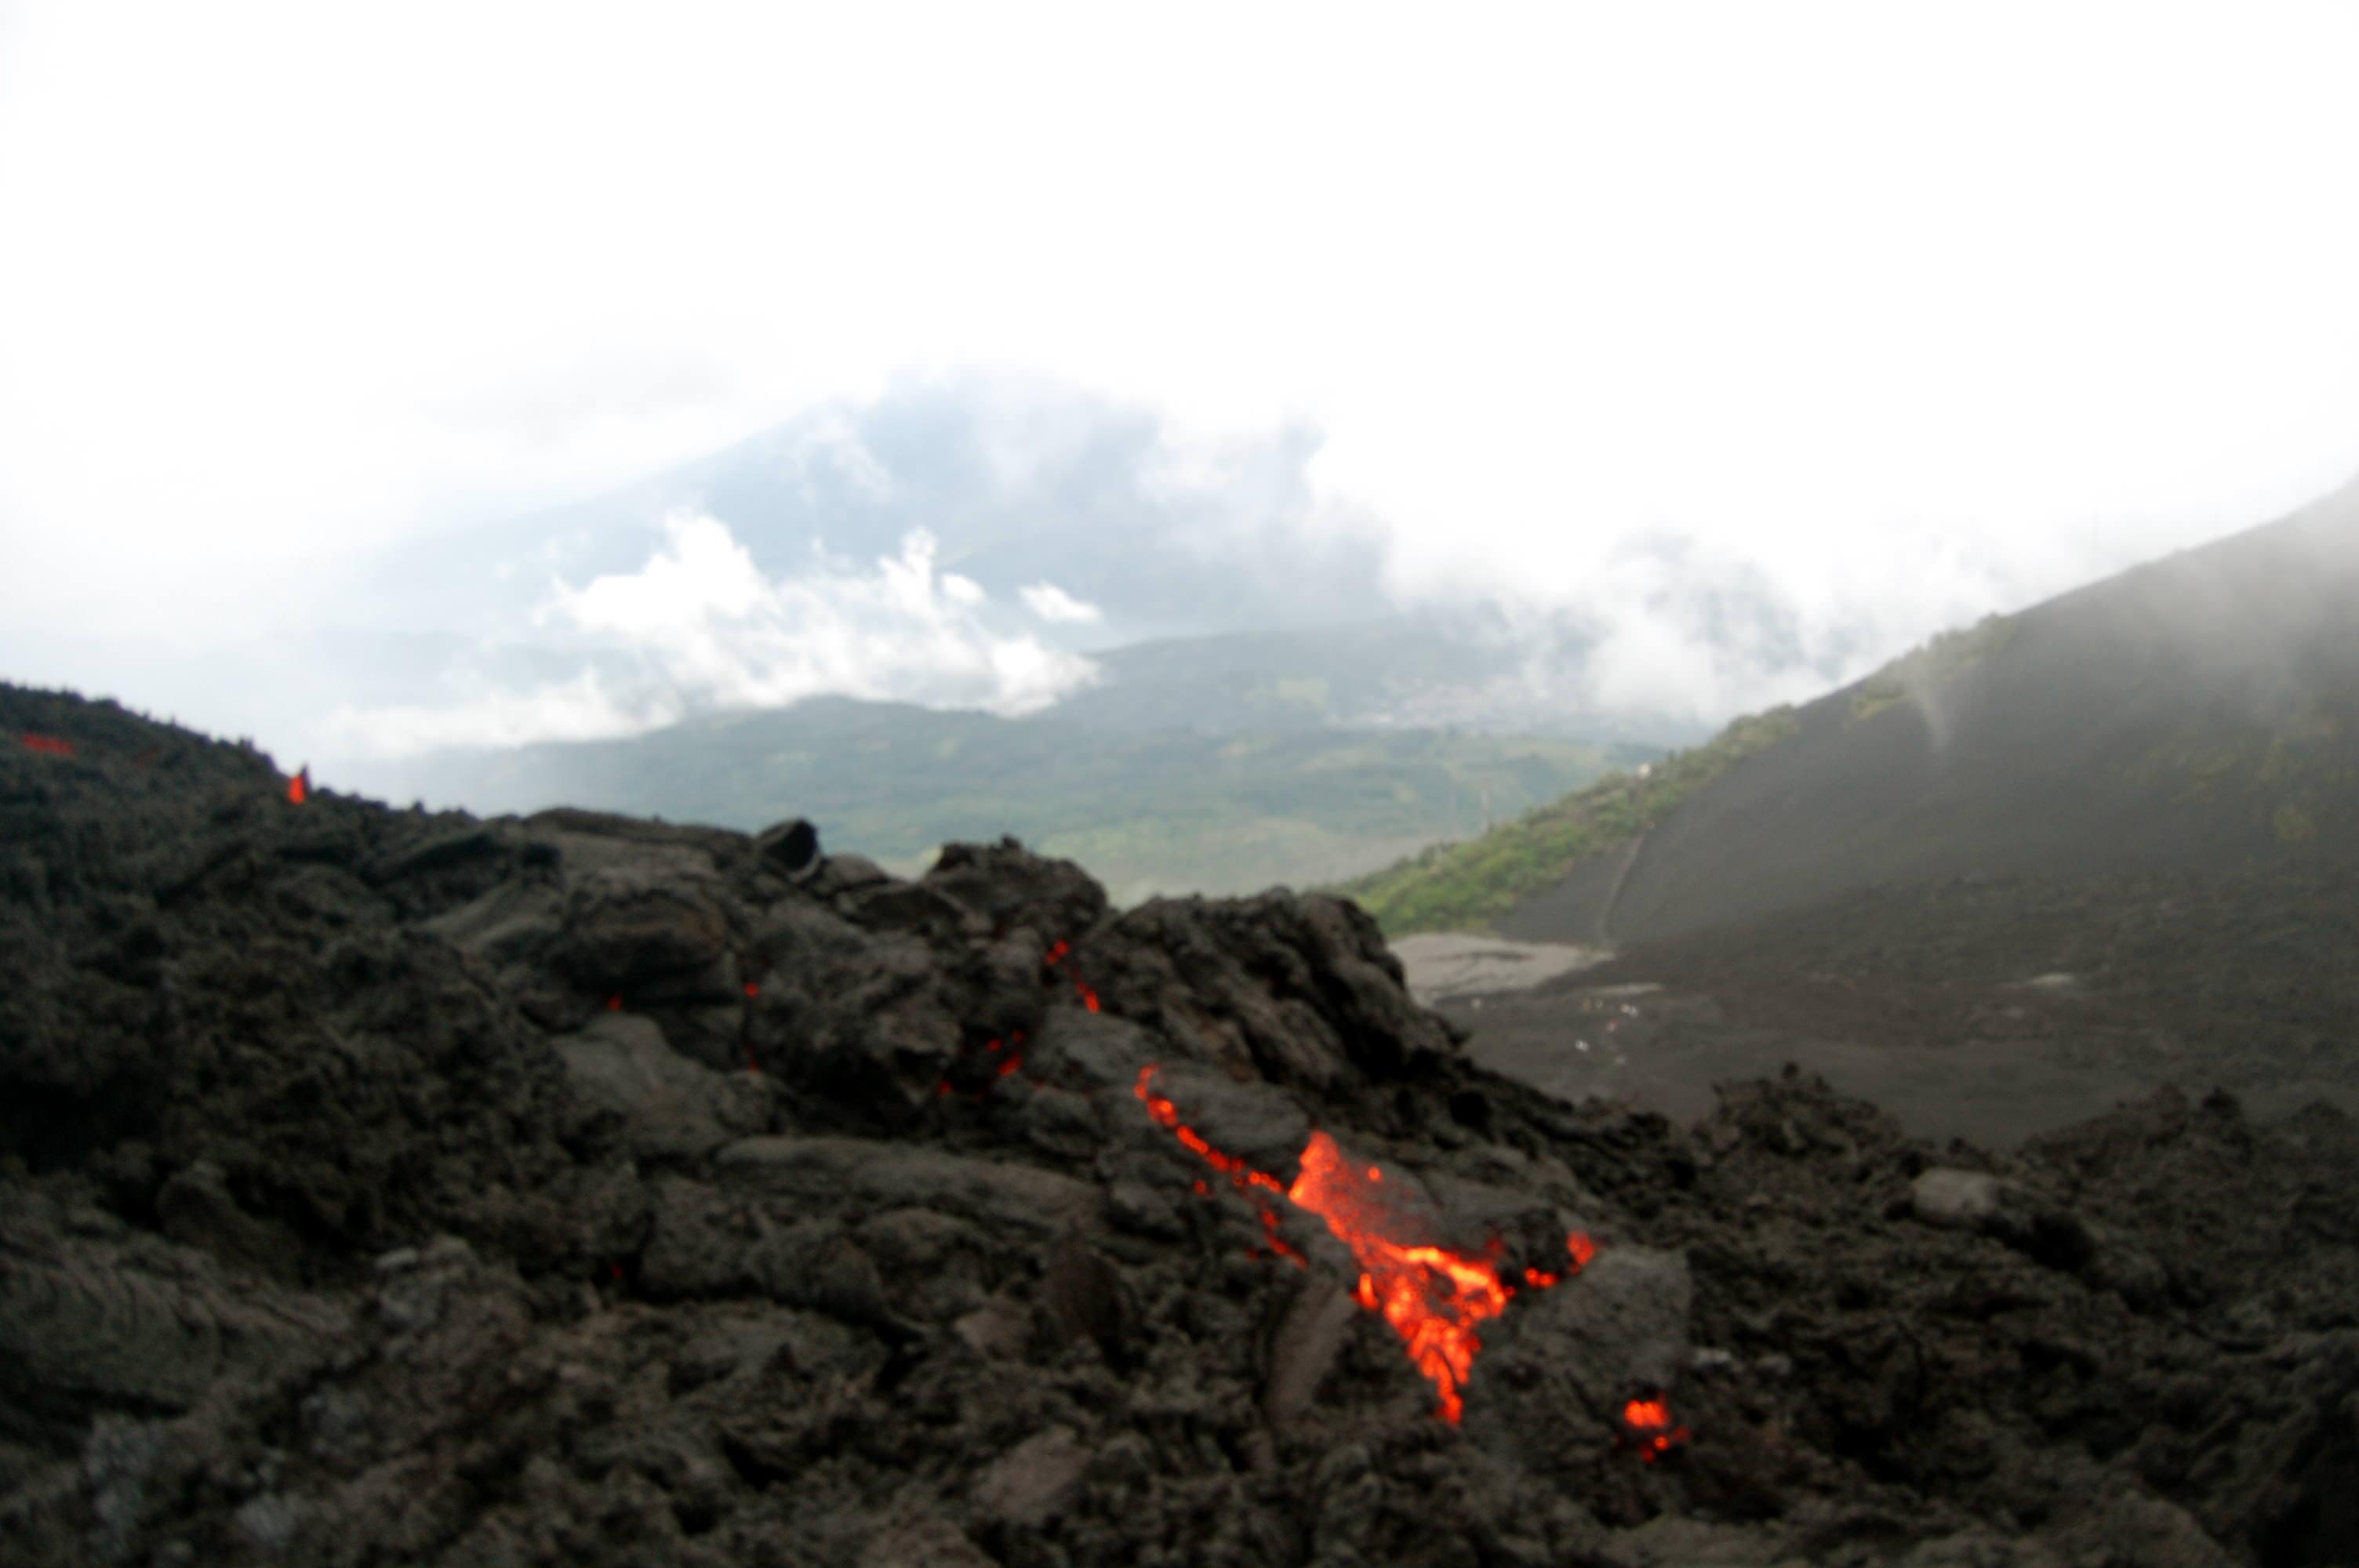 View of lava on Pacaya Volcano in Guatemala